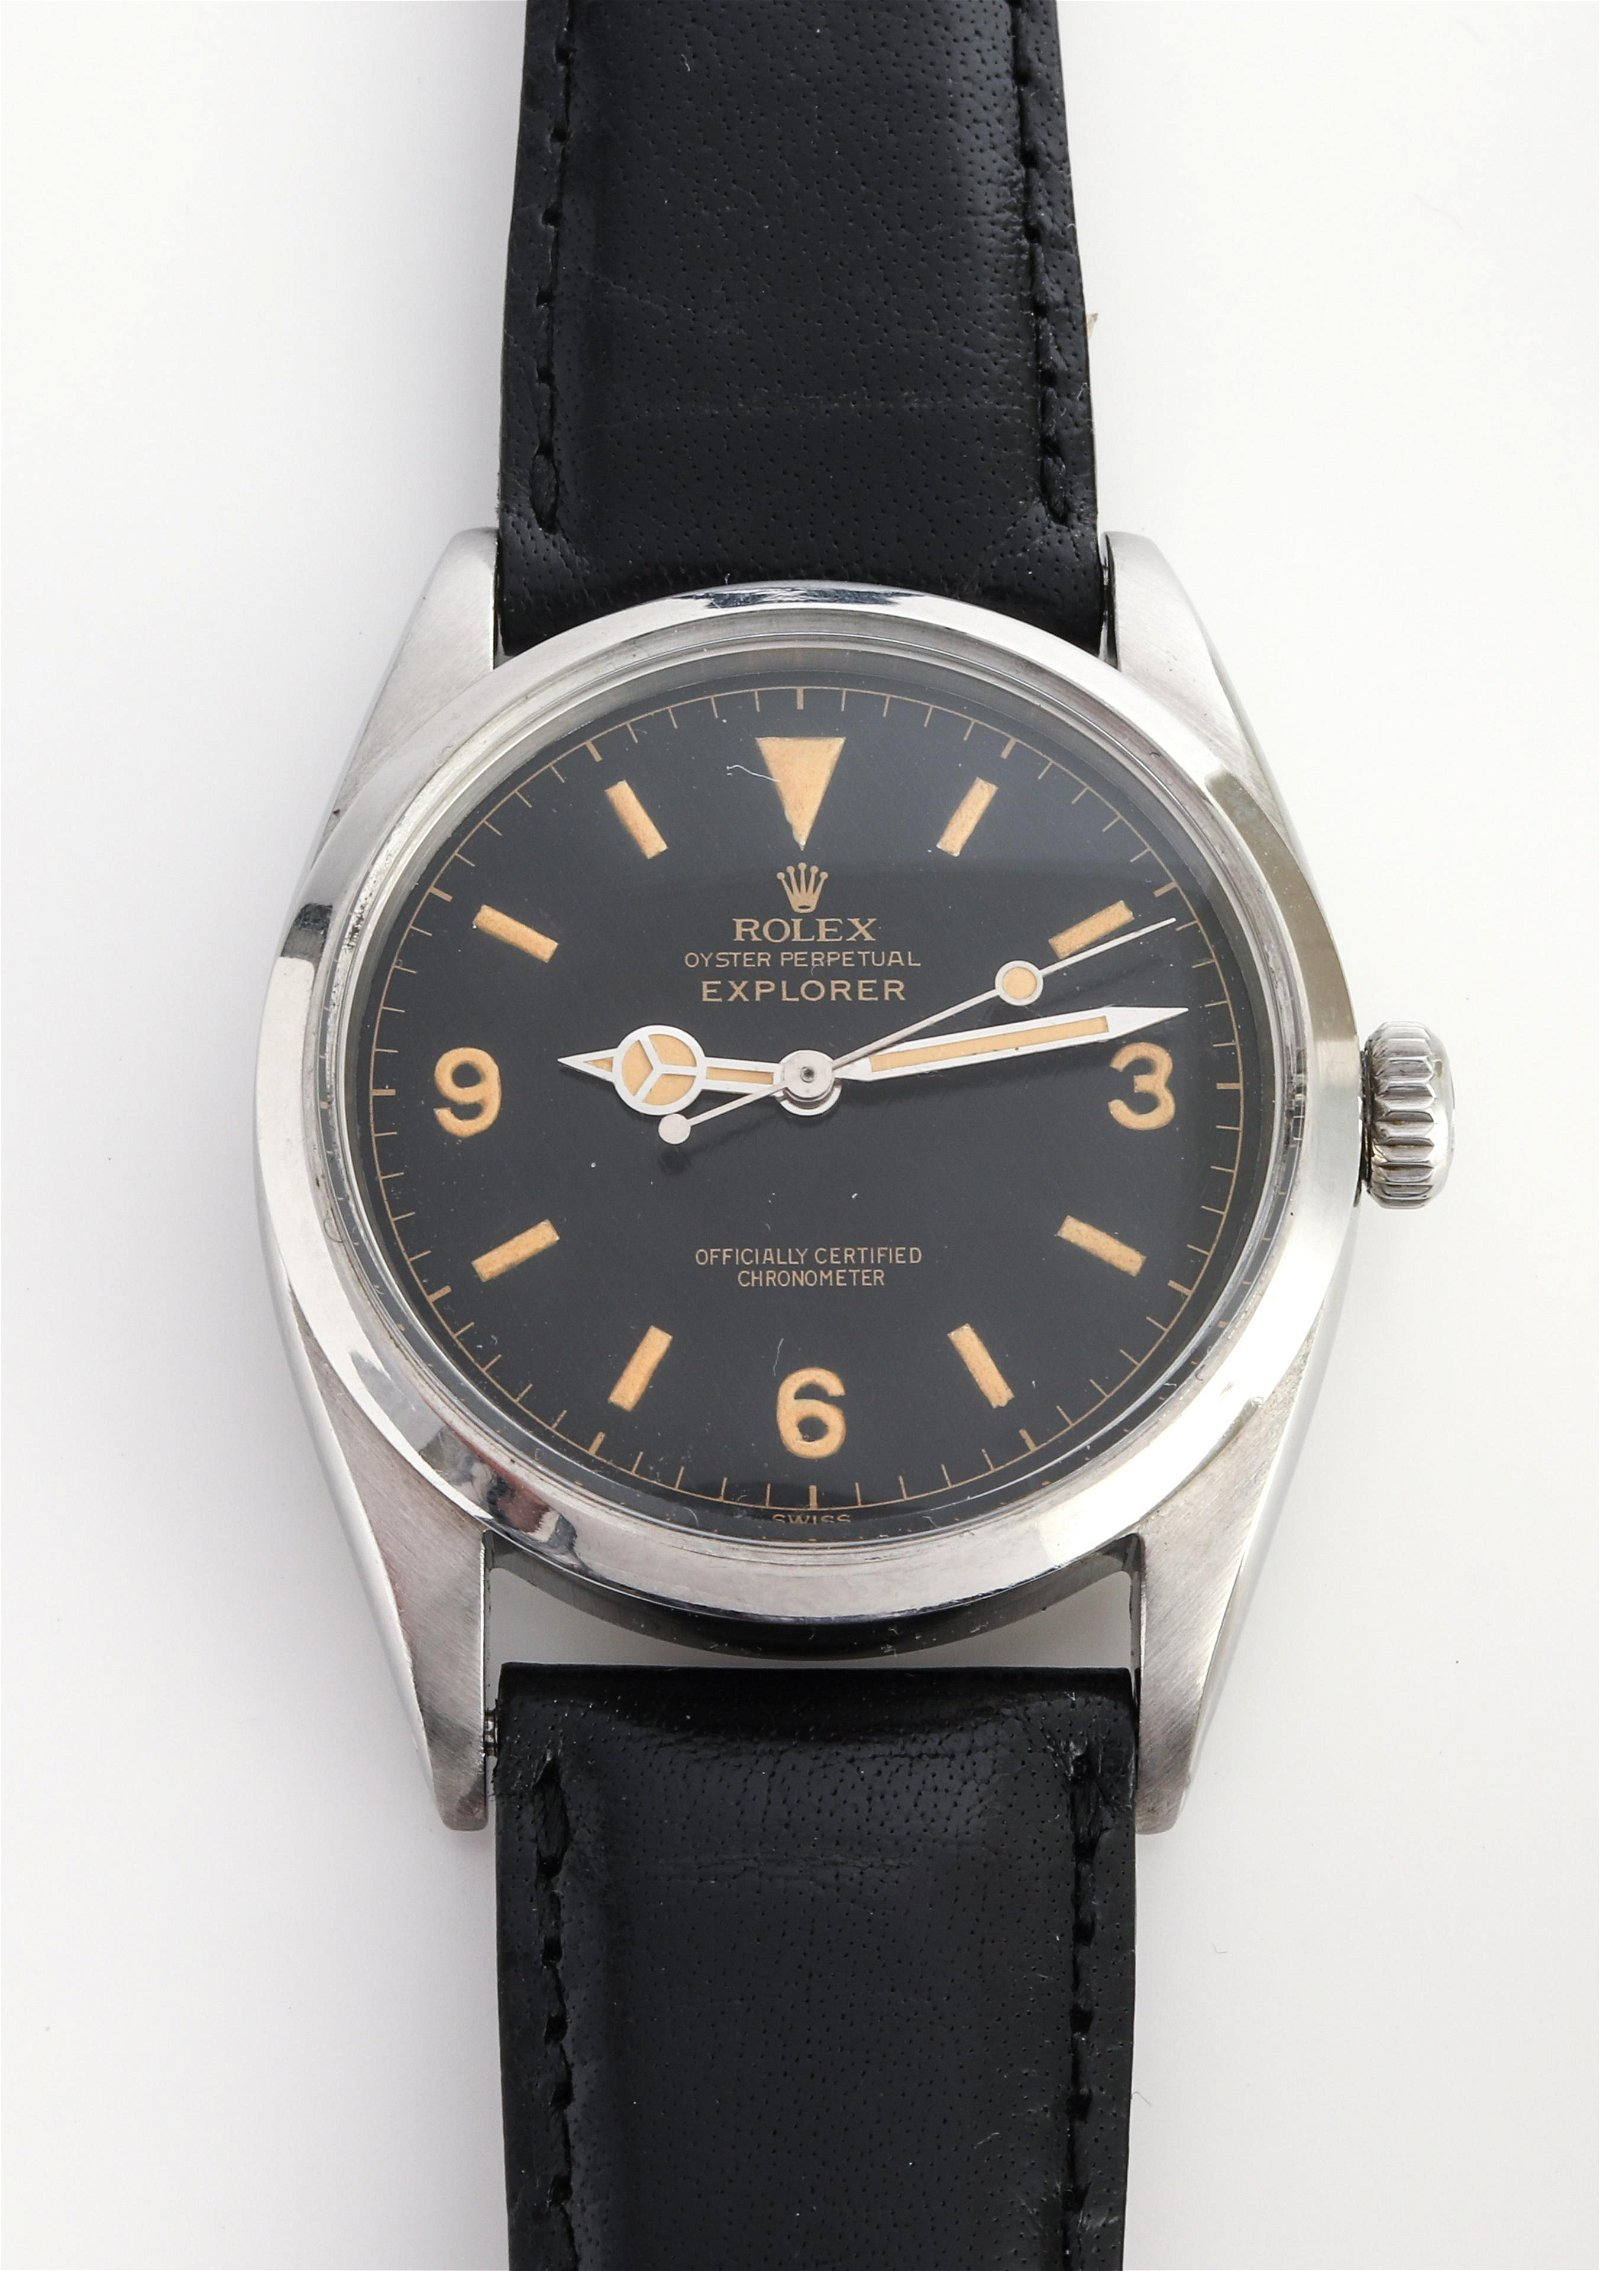 Rolex Explorer Oyster Perpetual Chronometer Watch